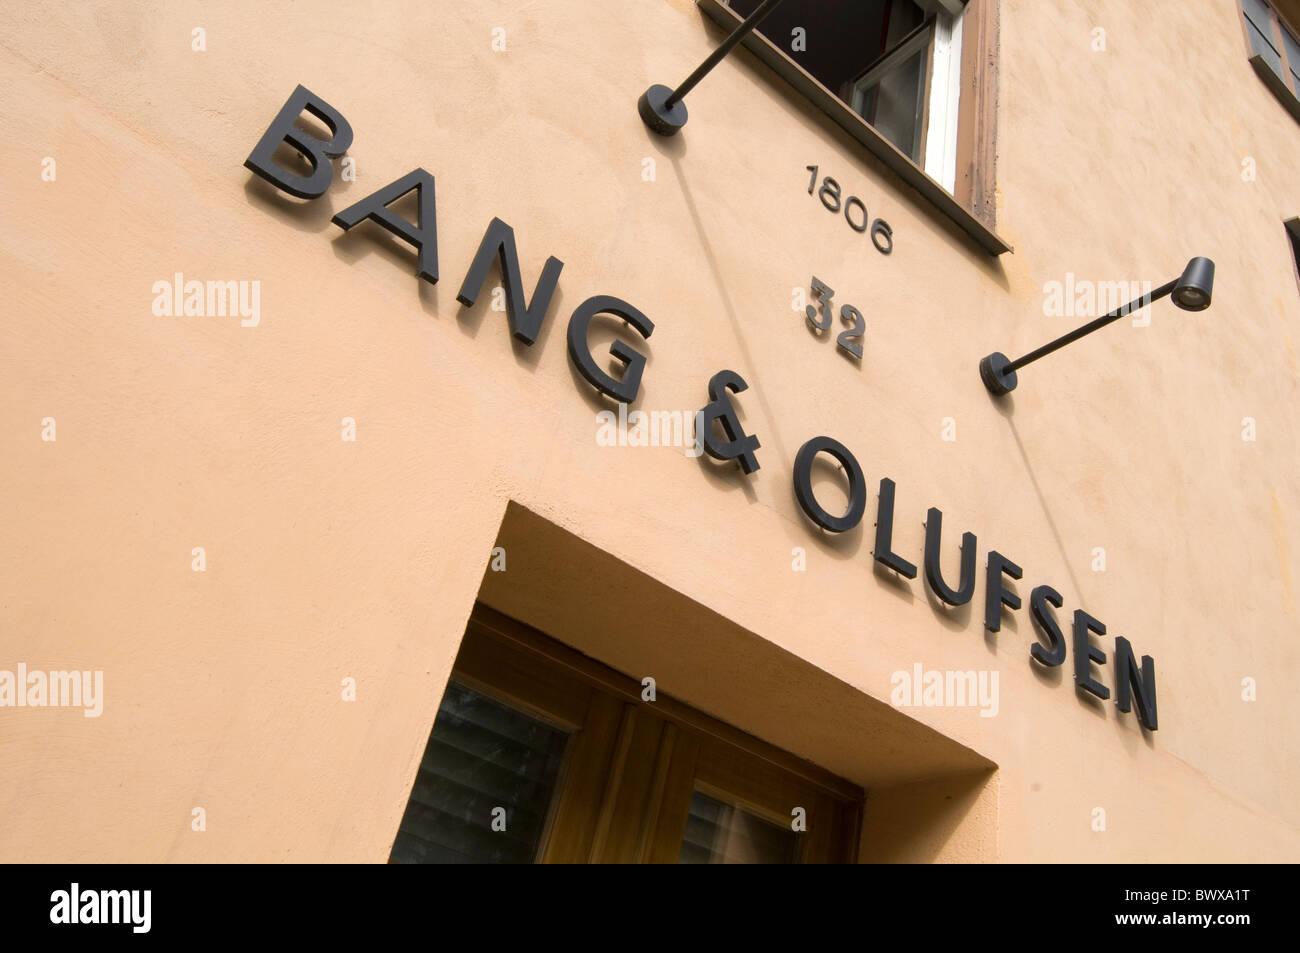 Bang & Olufsen B&O danish hi fi equipment manufacturer style stylish audio tv television denmark shop shops - Stock Image